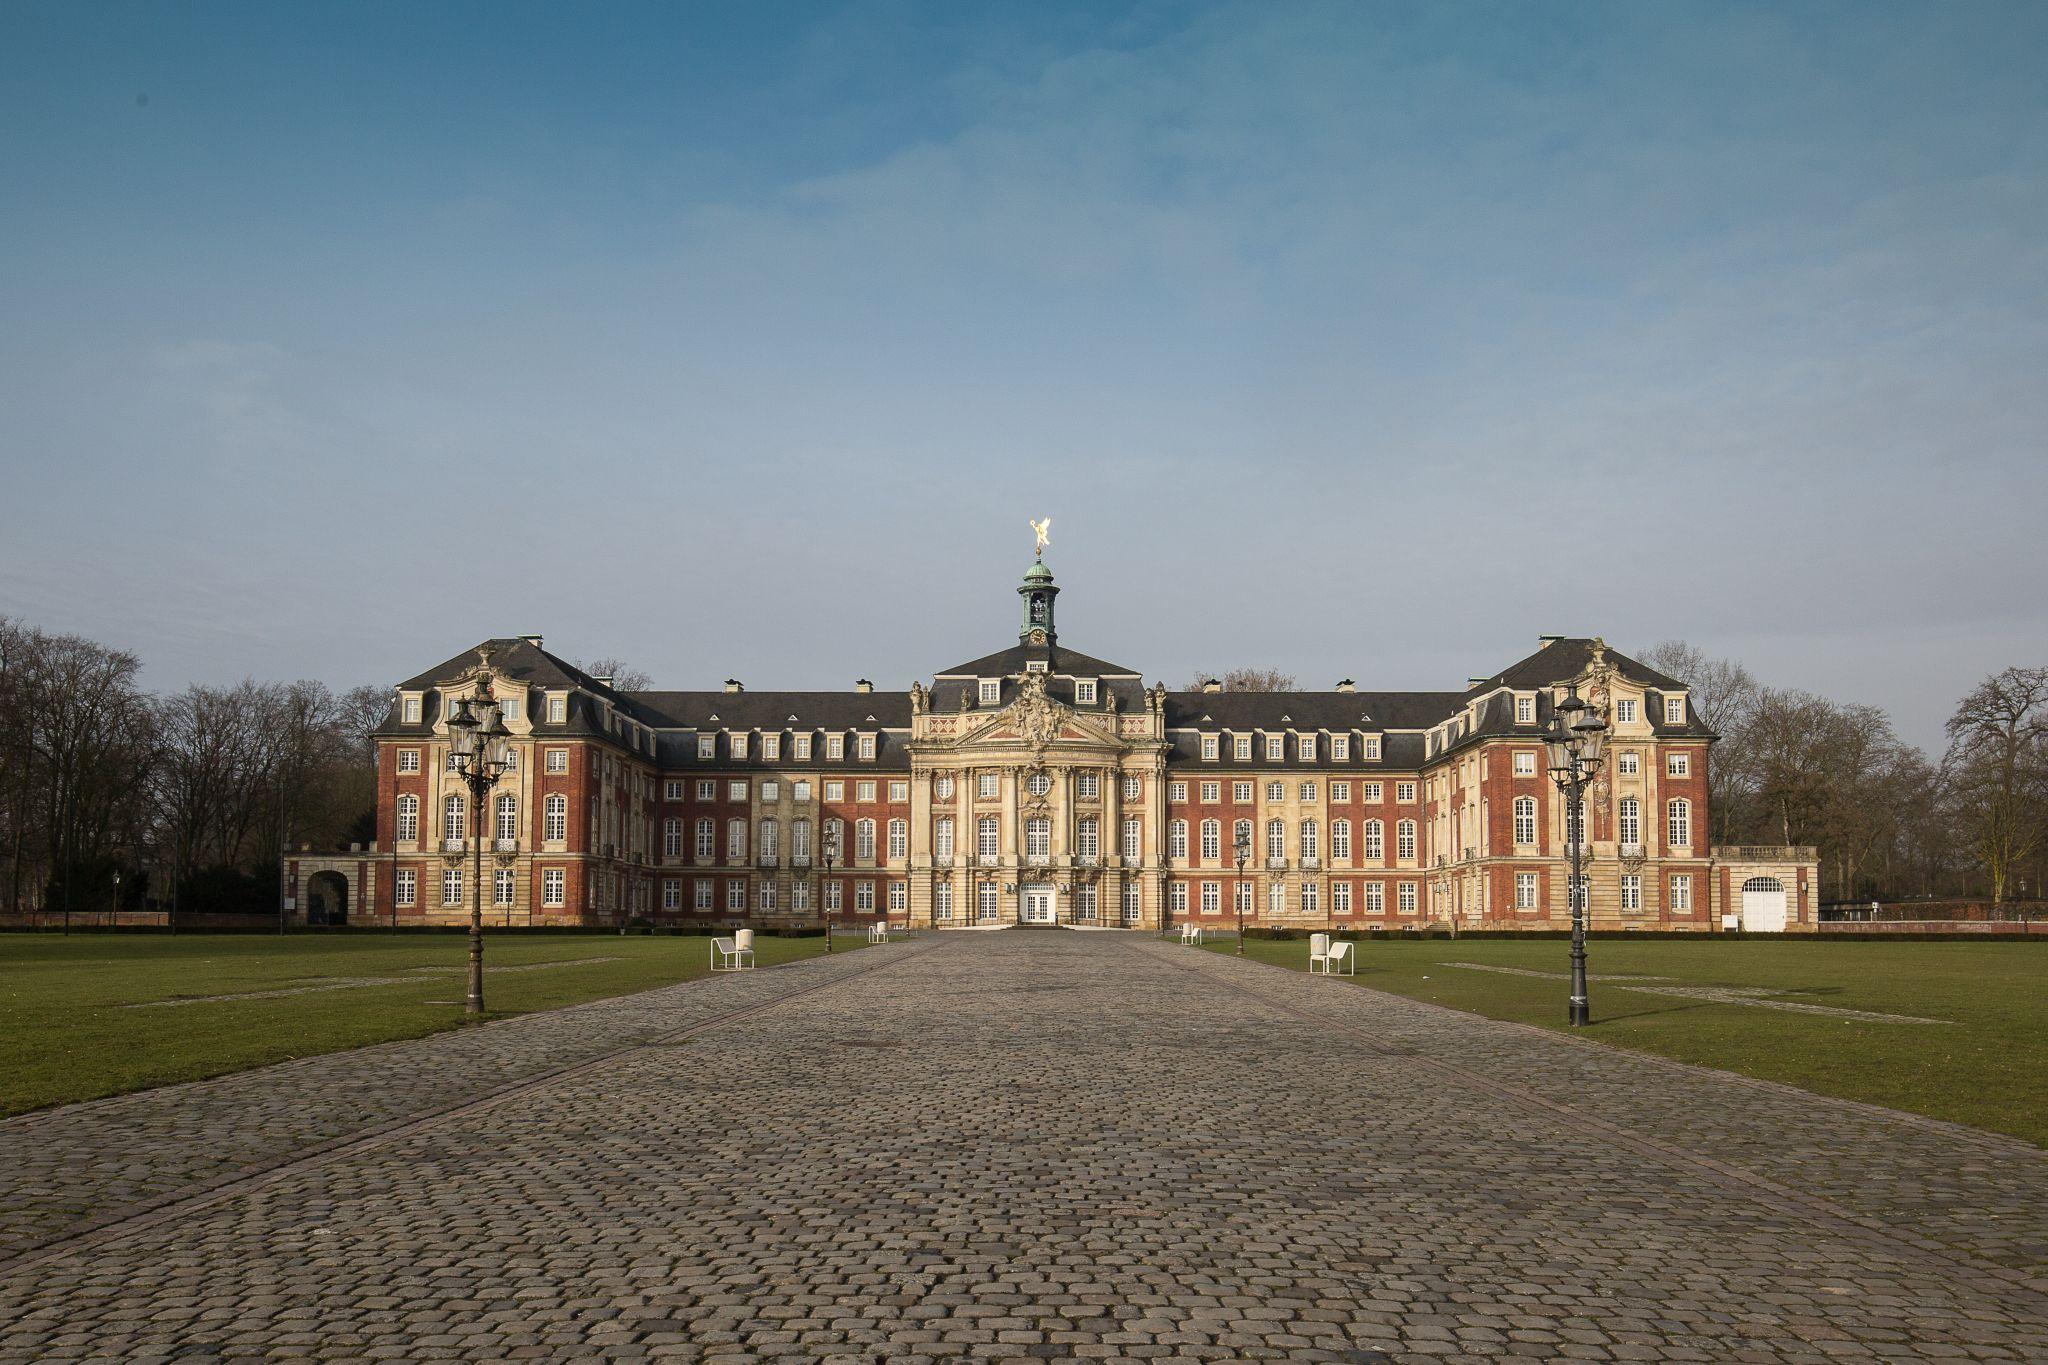 Castle of Münster, Germany